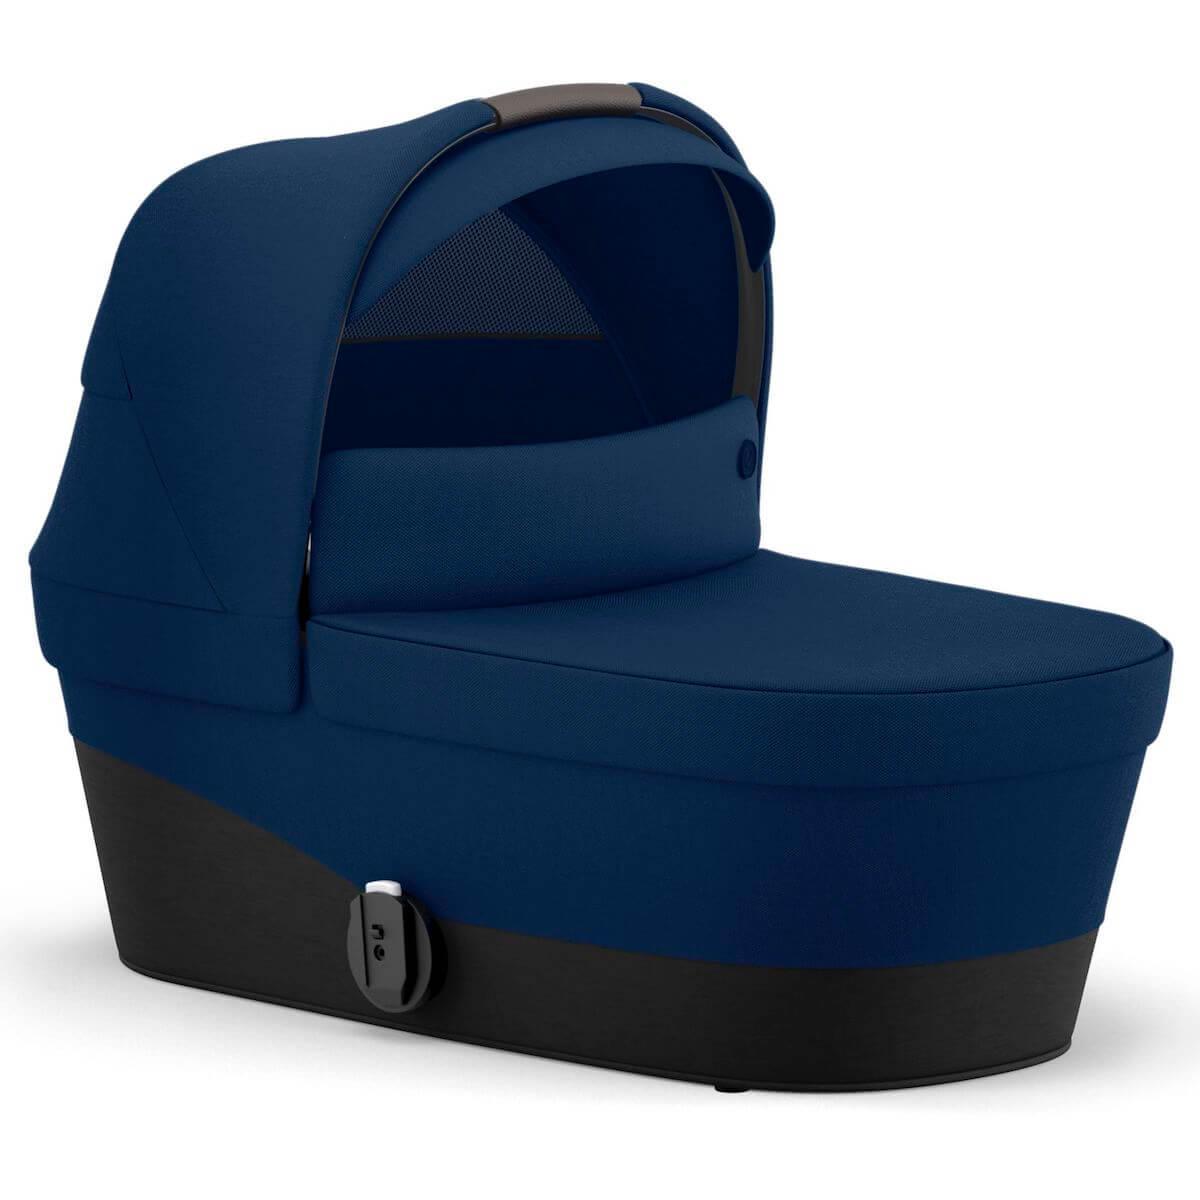 Nacelle GAZELLE S Cybex Navy blue